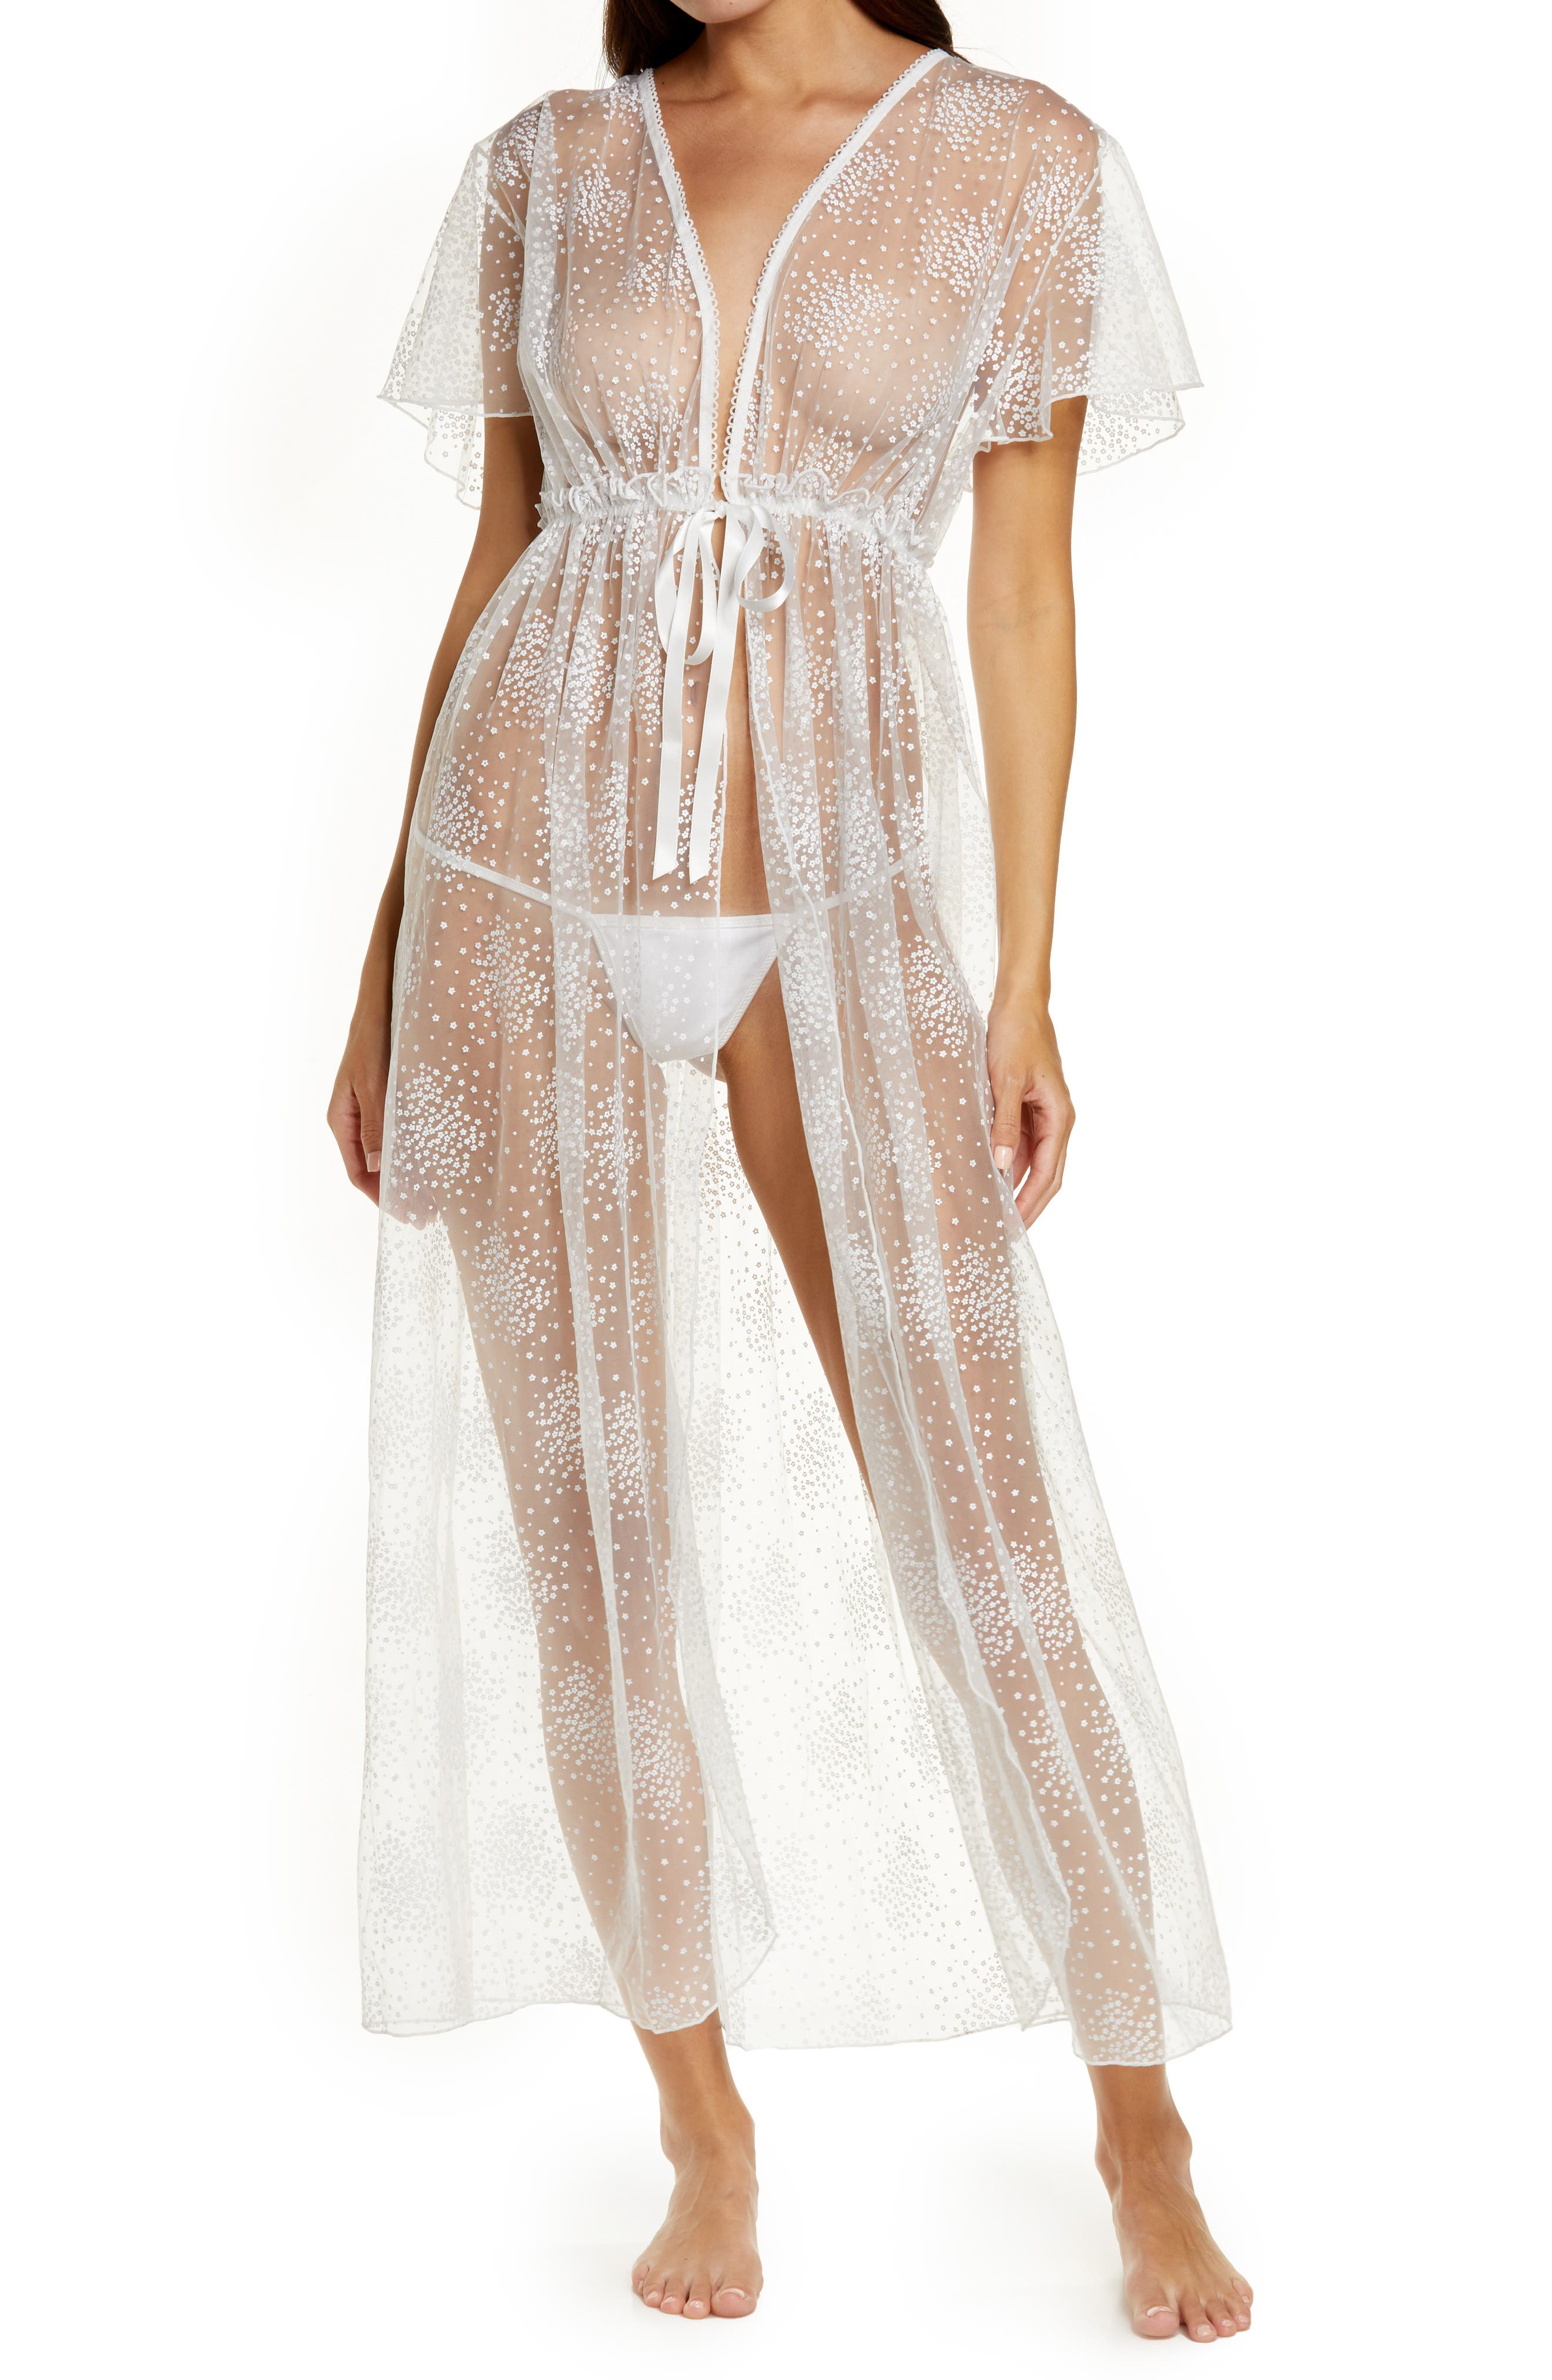 Long Lace Robe & G-String Thong Set